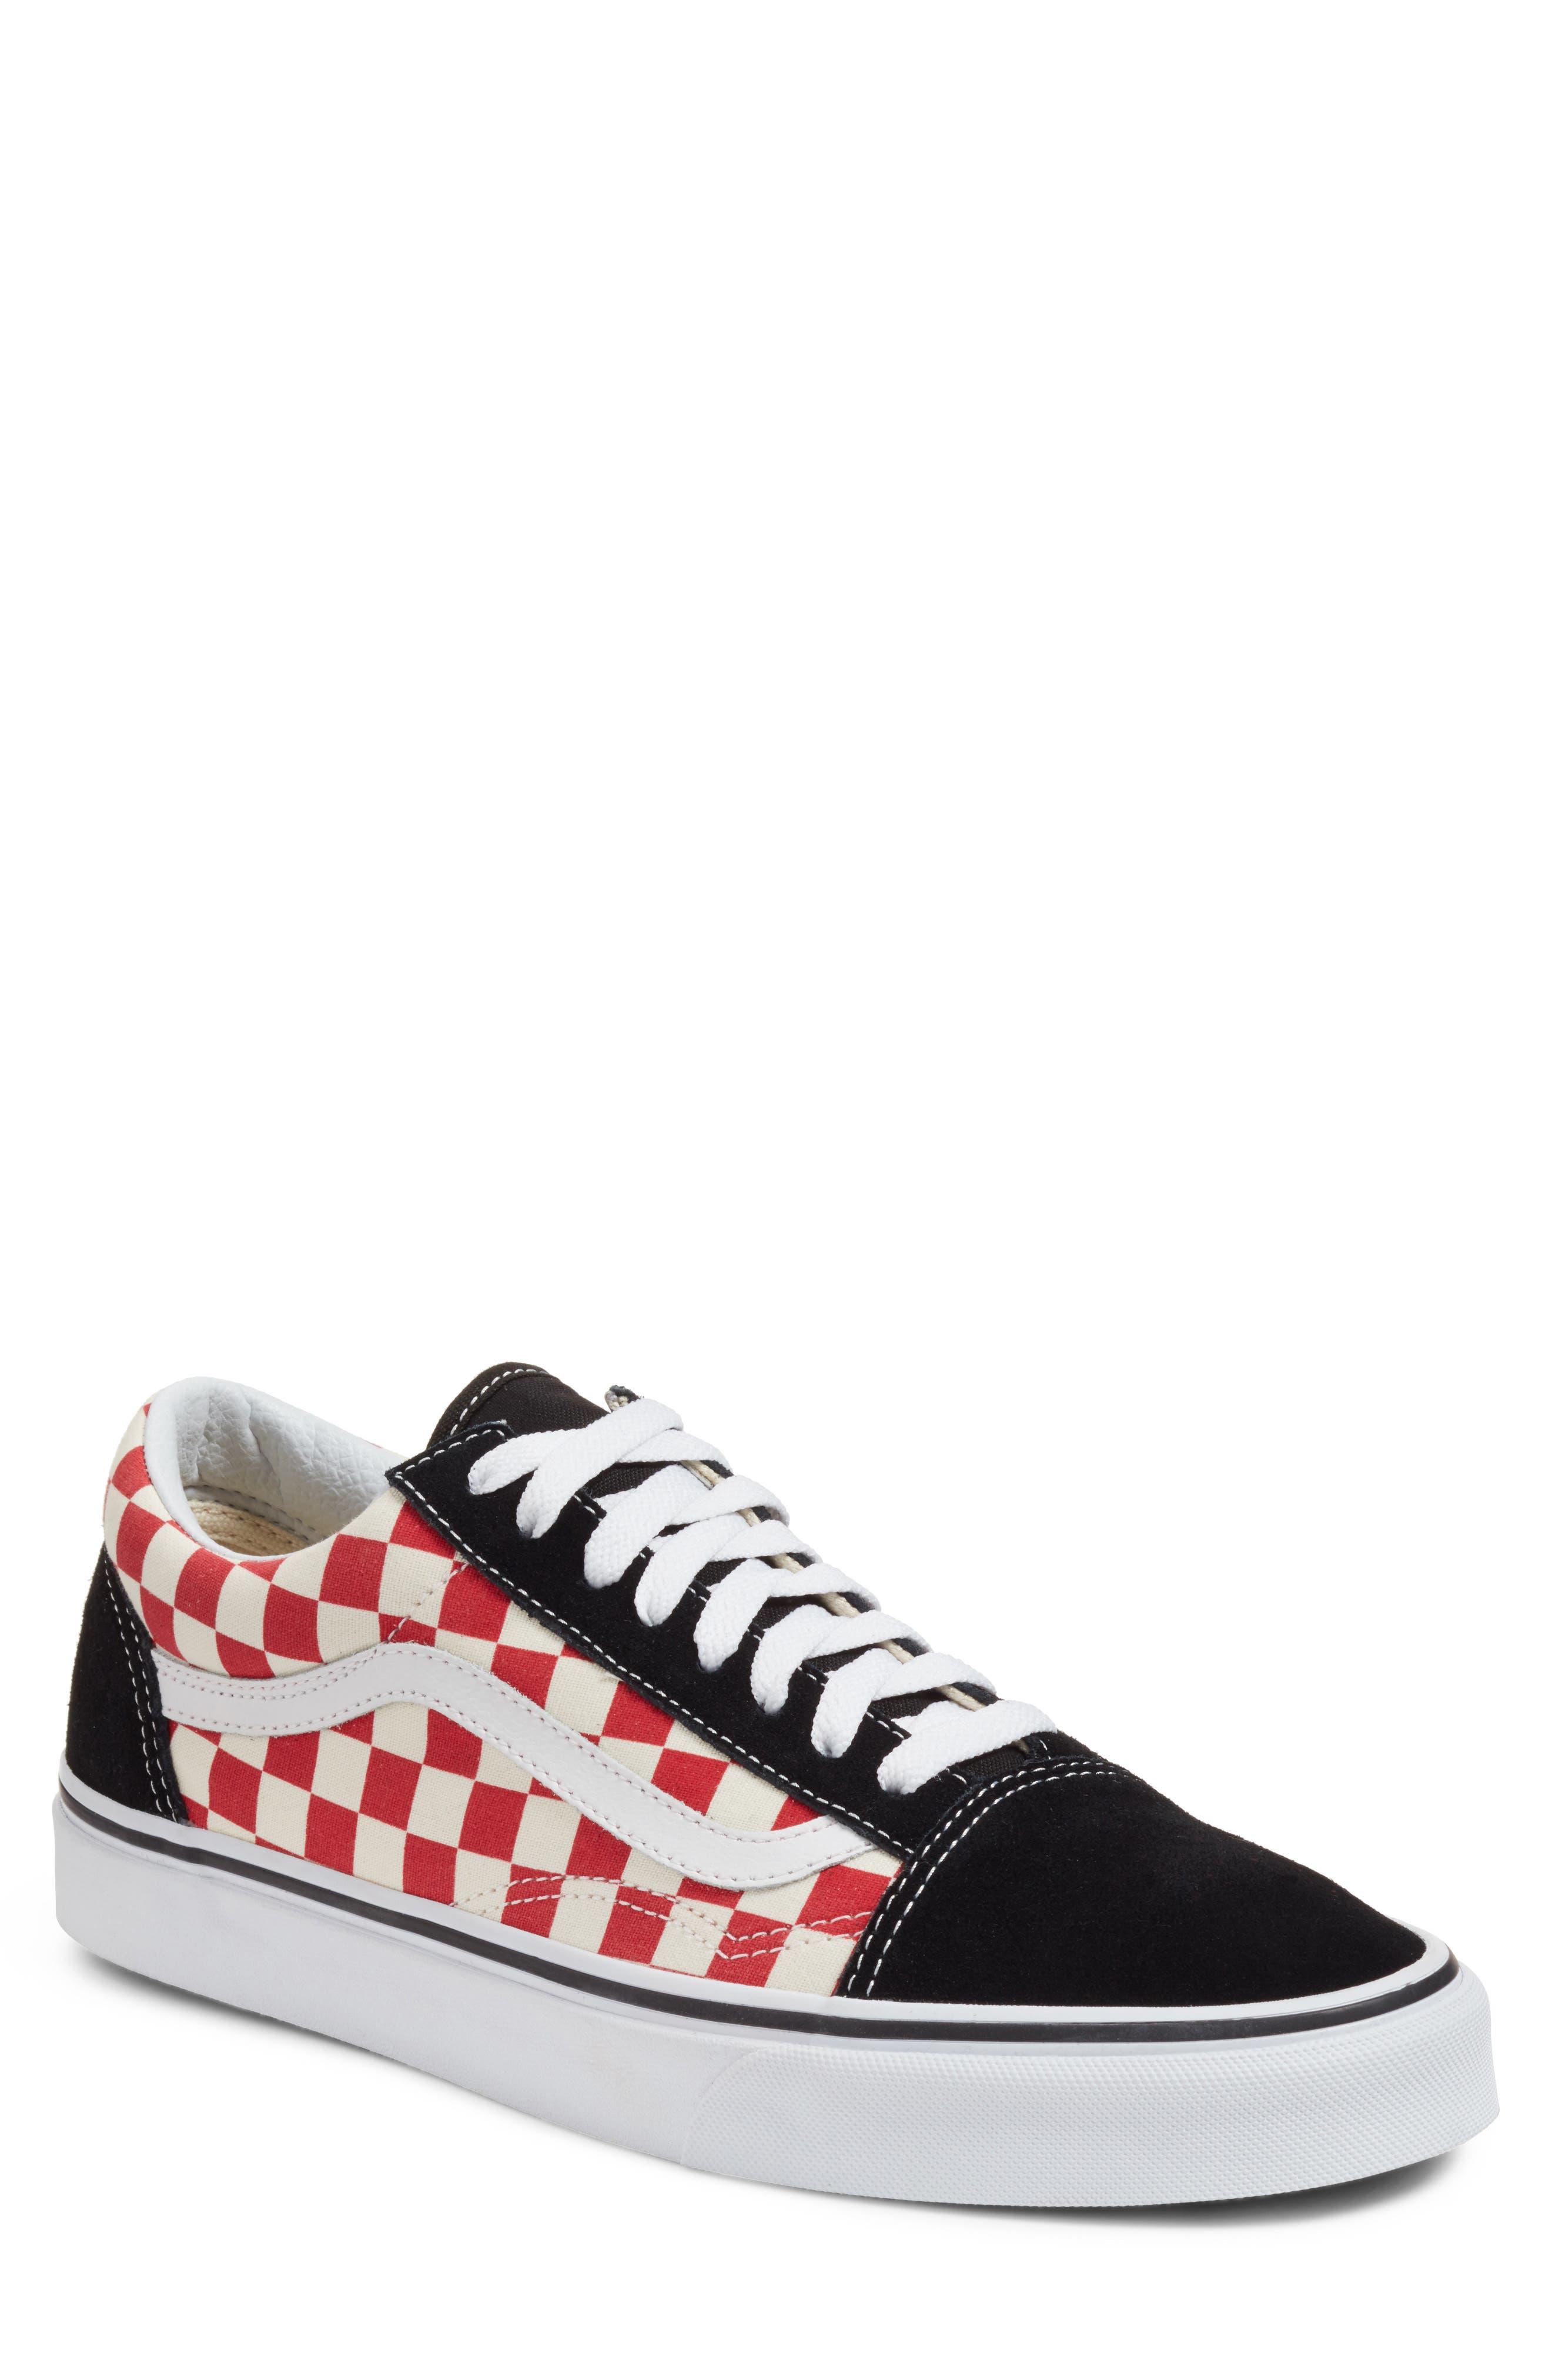 Old Skool Sneaker,                         Main,                         color, Black/ Red Checkerboard